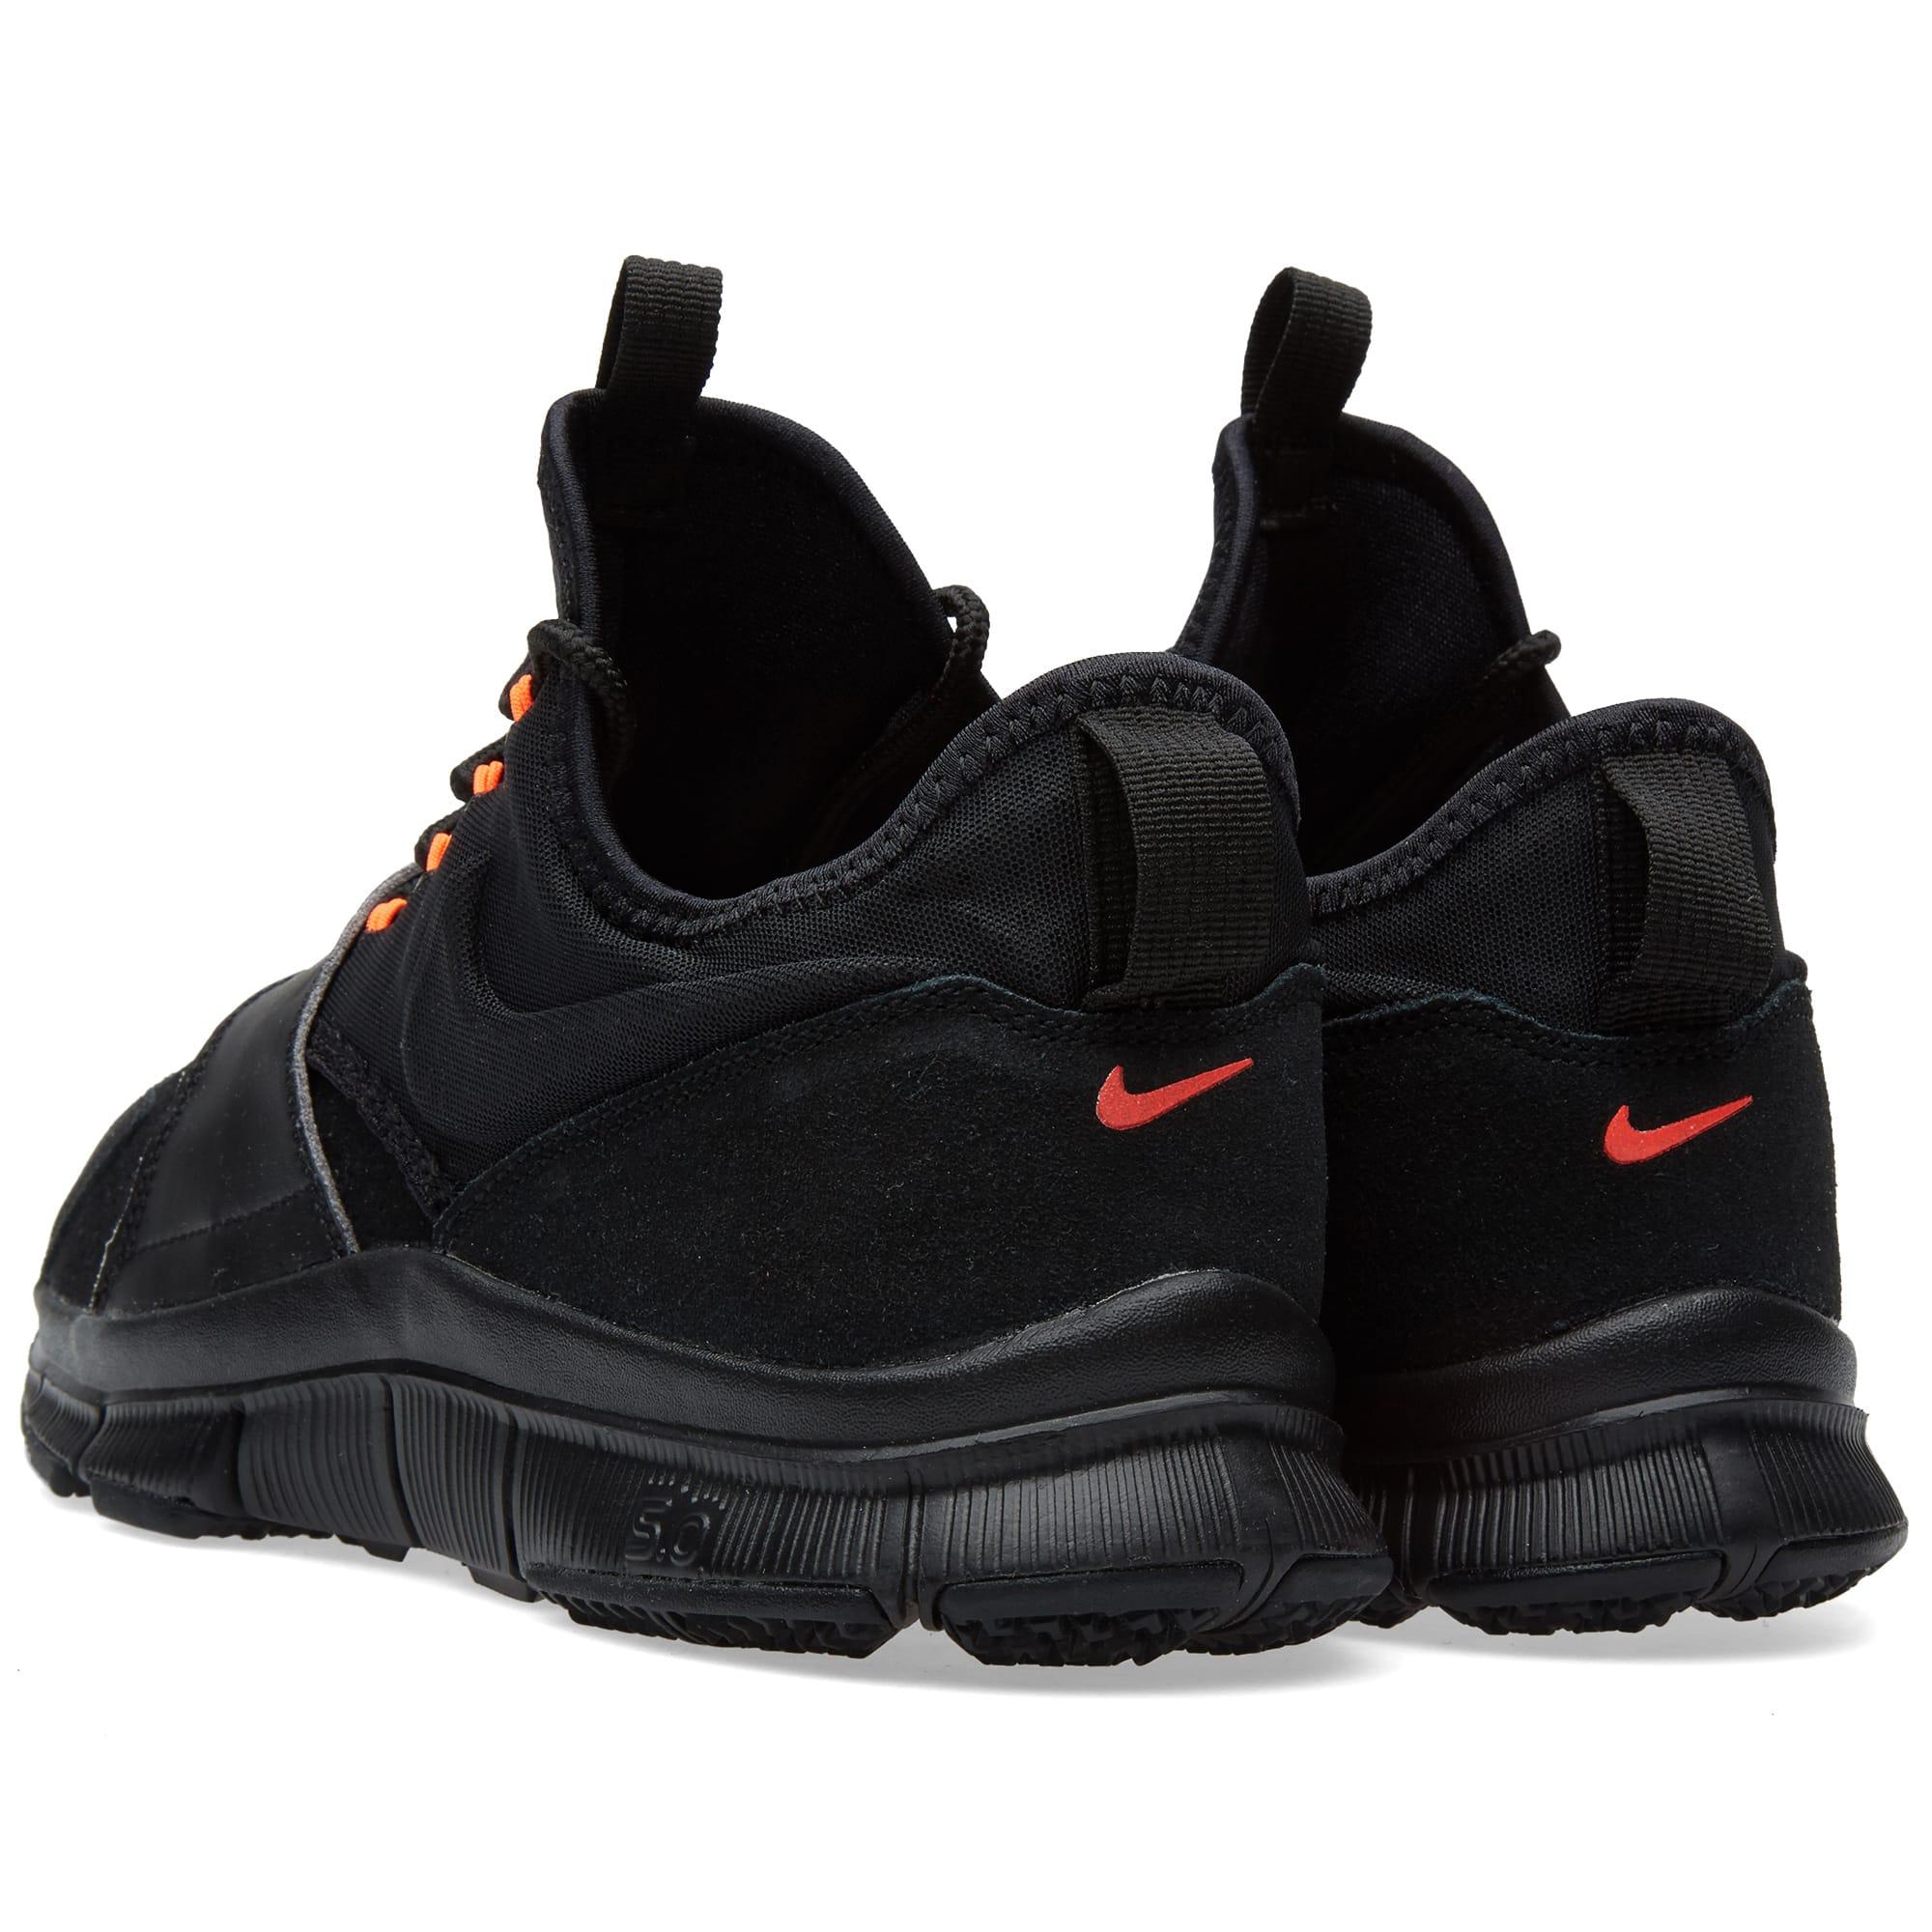 new product e9803 8a017 Nike Free Ace Leather Black   Hyper Orange   END.